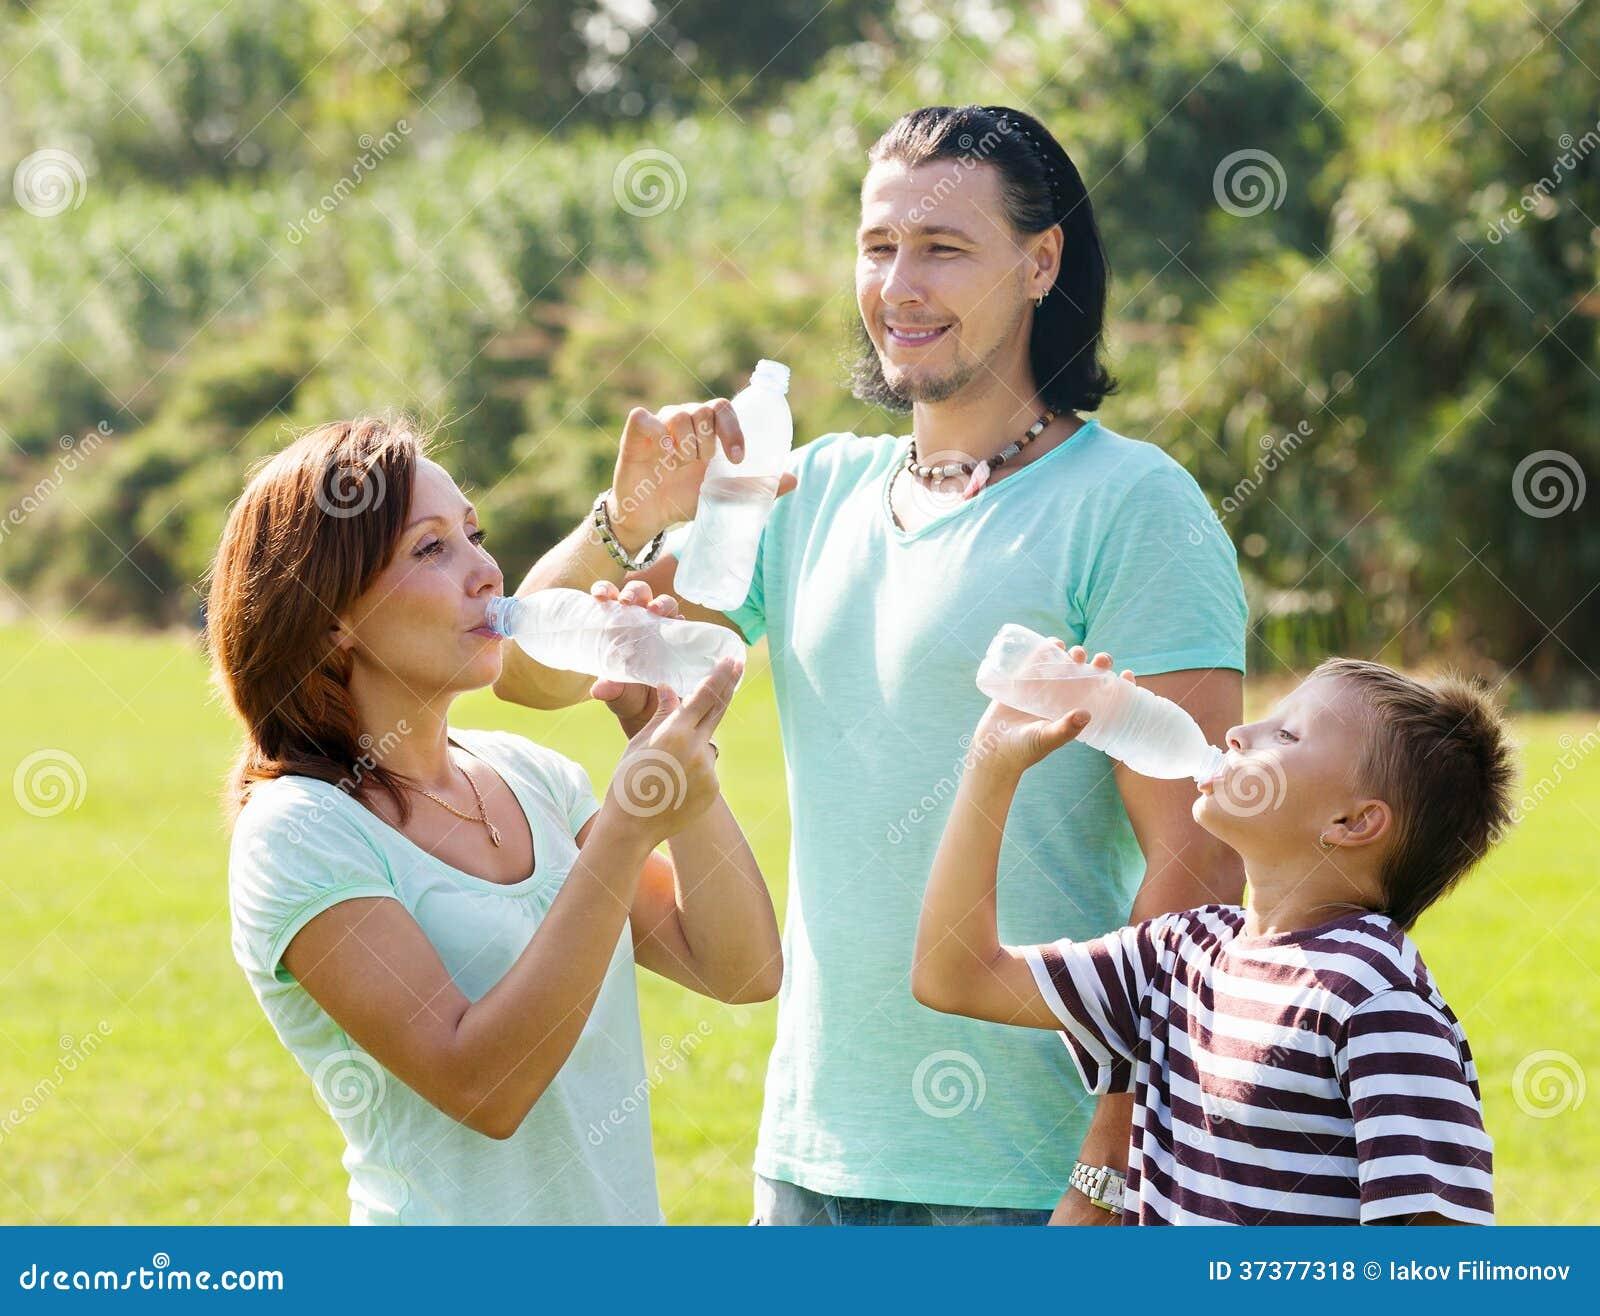 Para z nastolatek wodą pitną od butelek